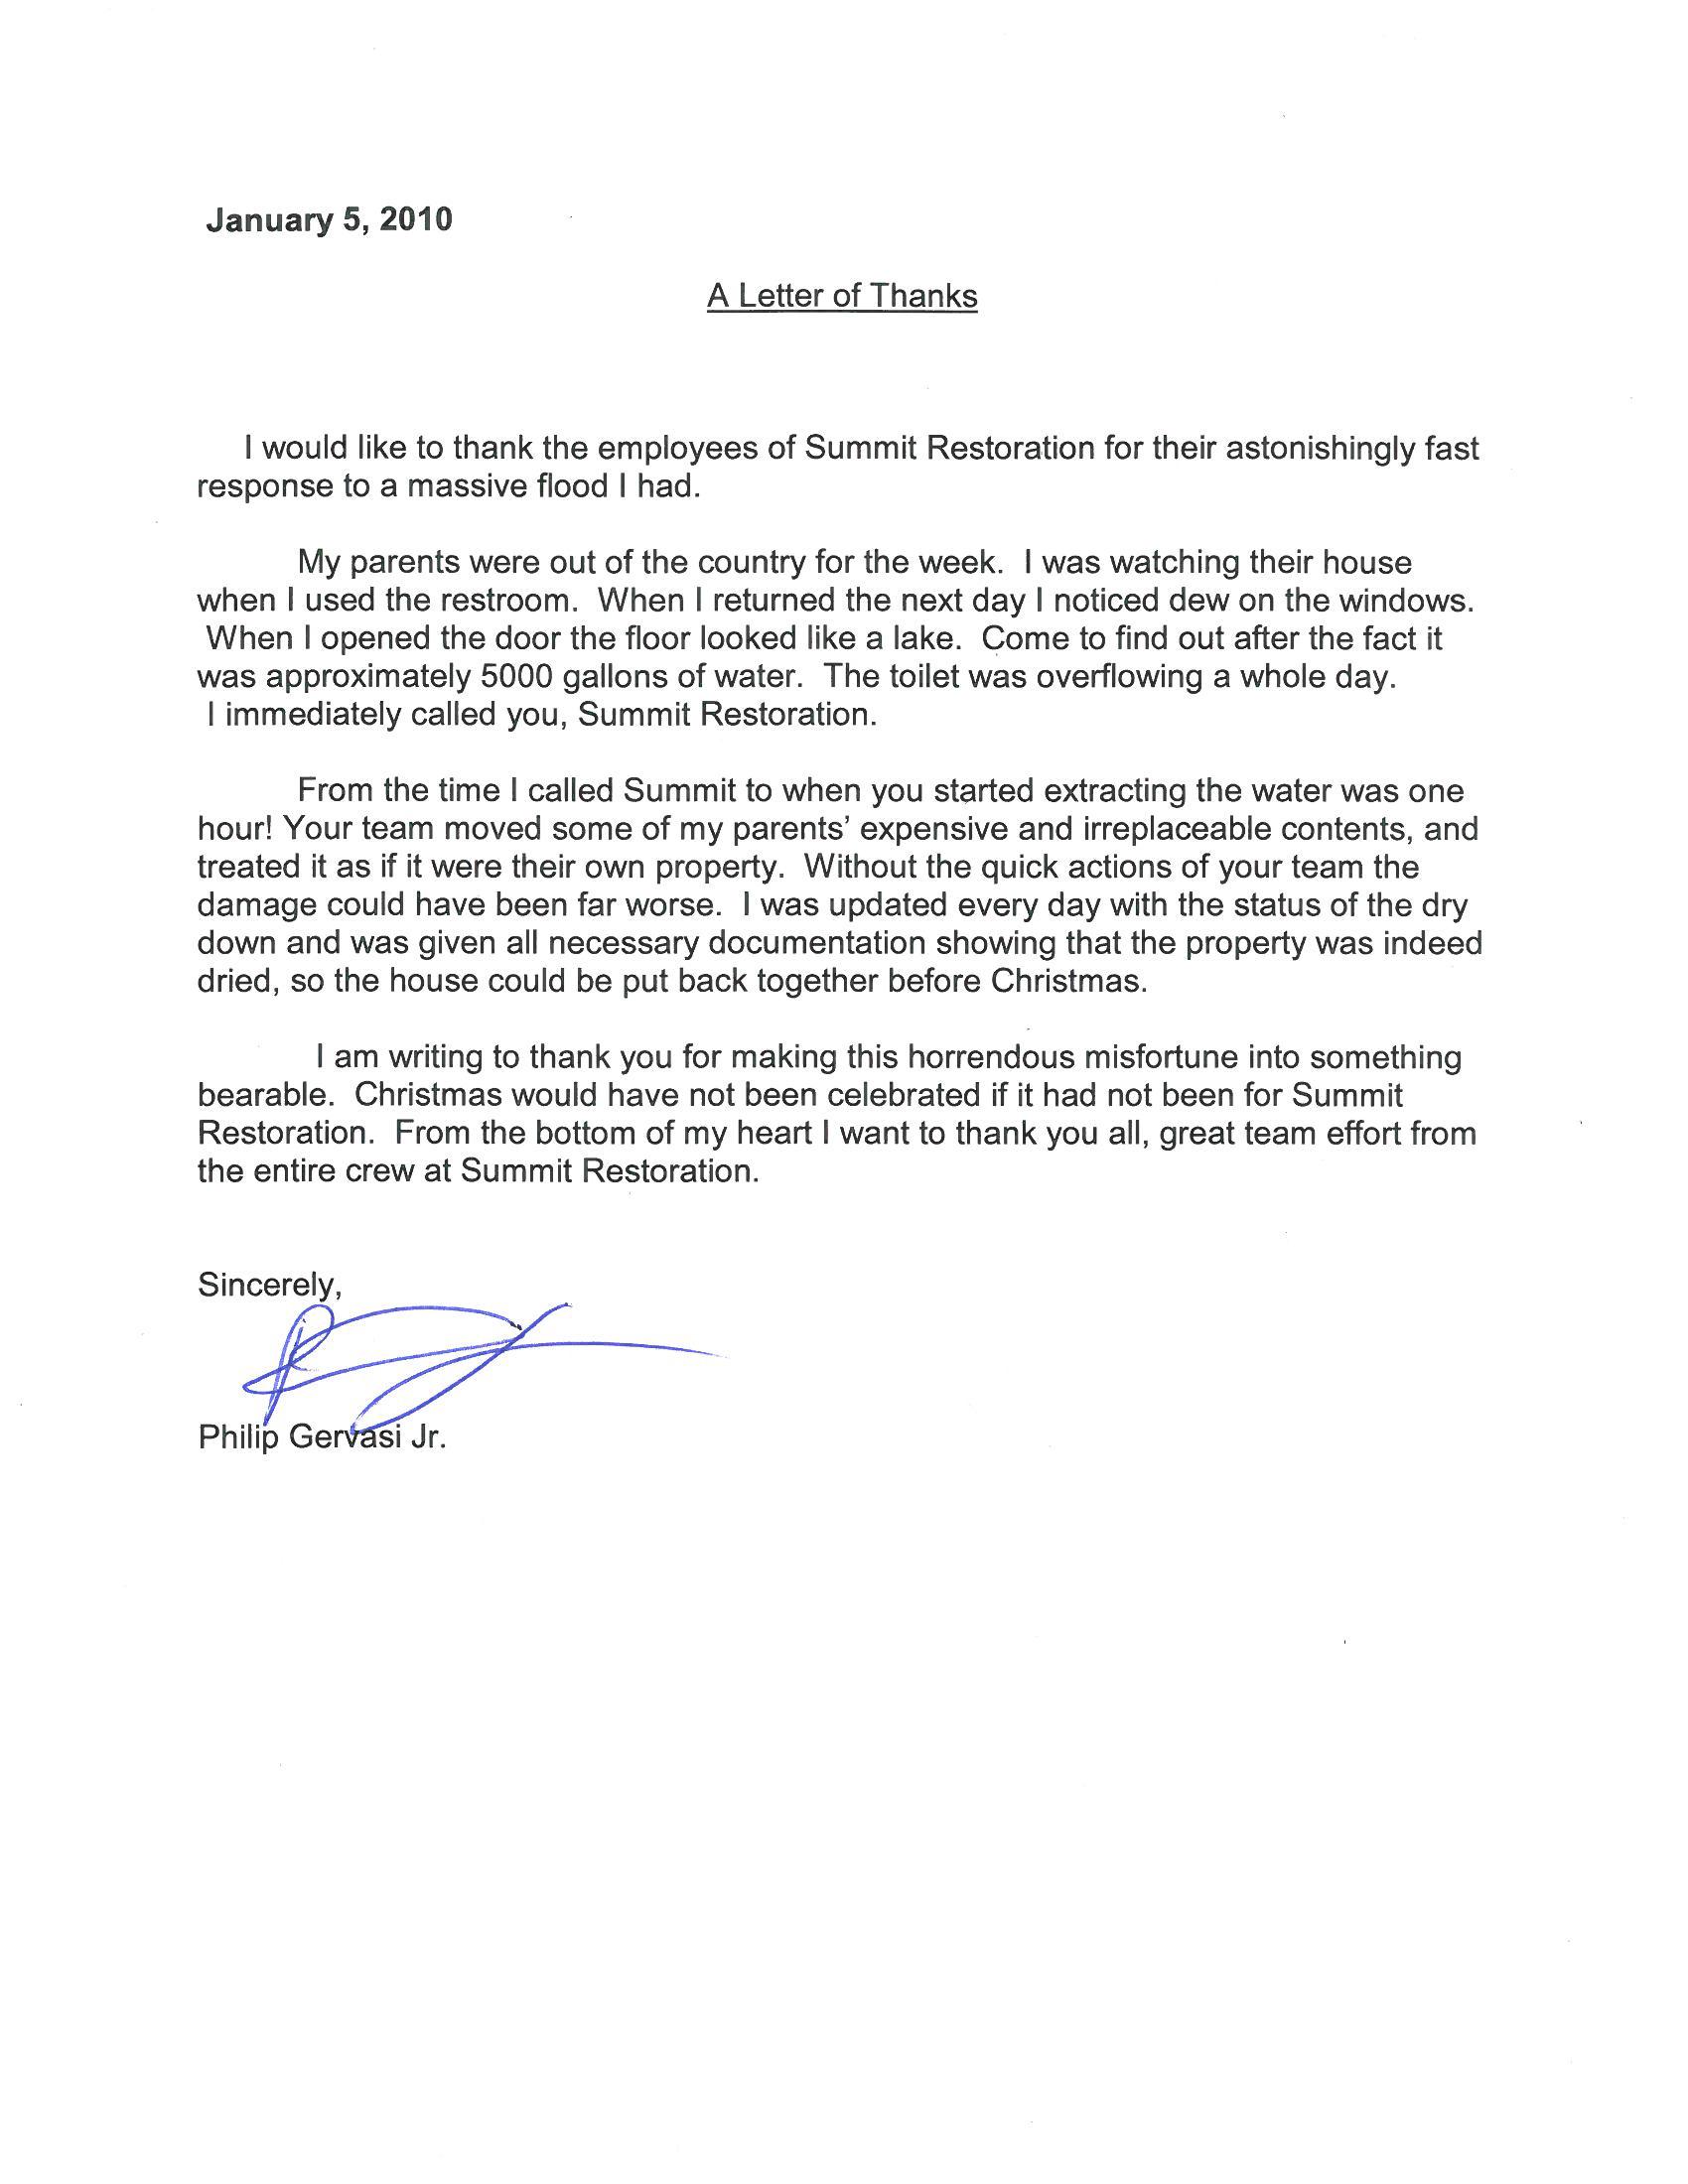 Testimonial from Philip Gervasi